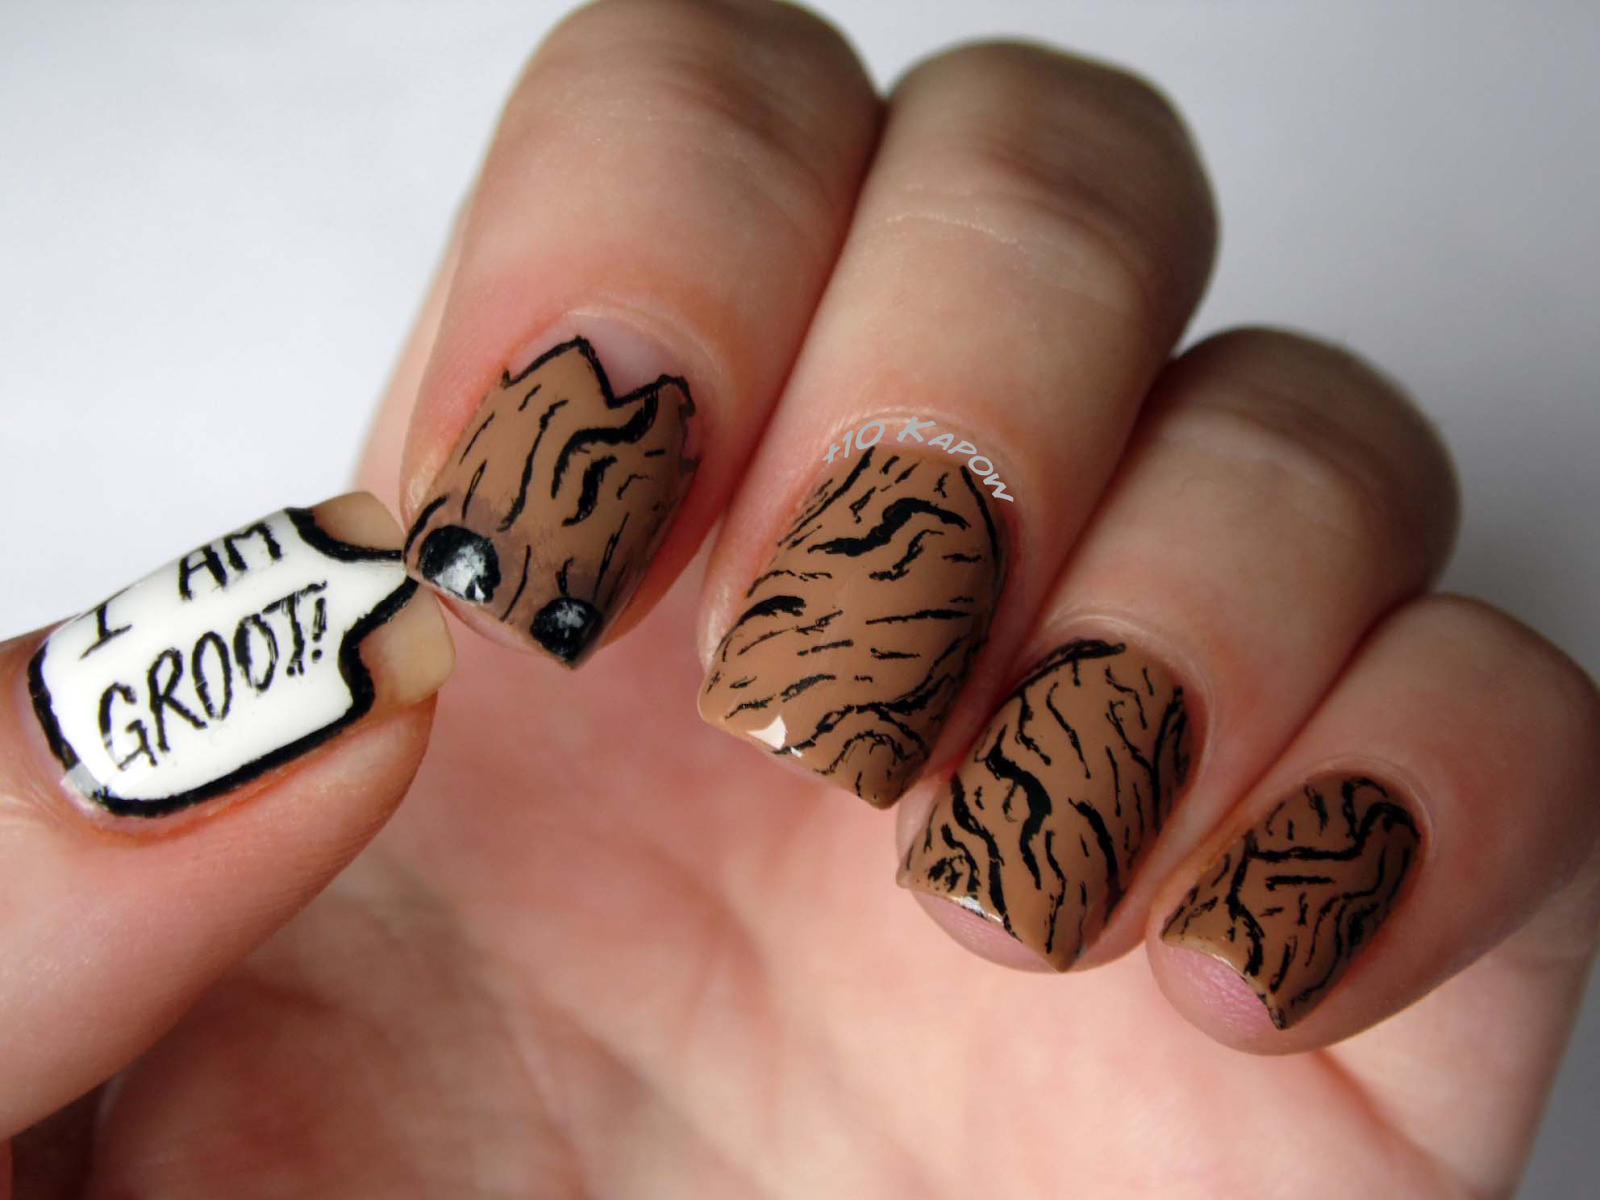 Plus10Kapow: I AM GROOT! Nails